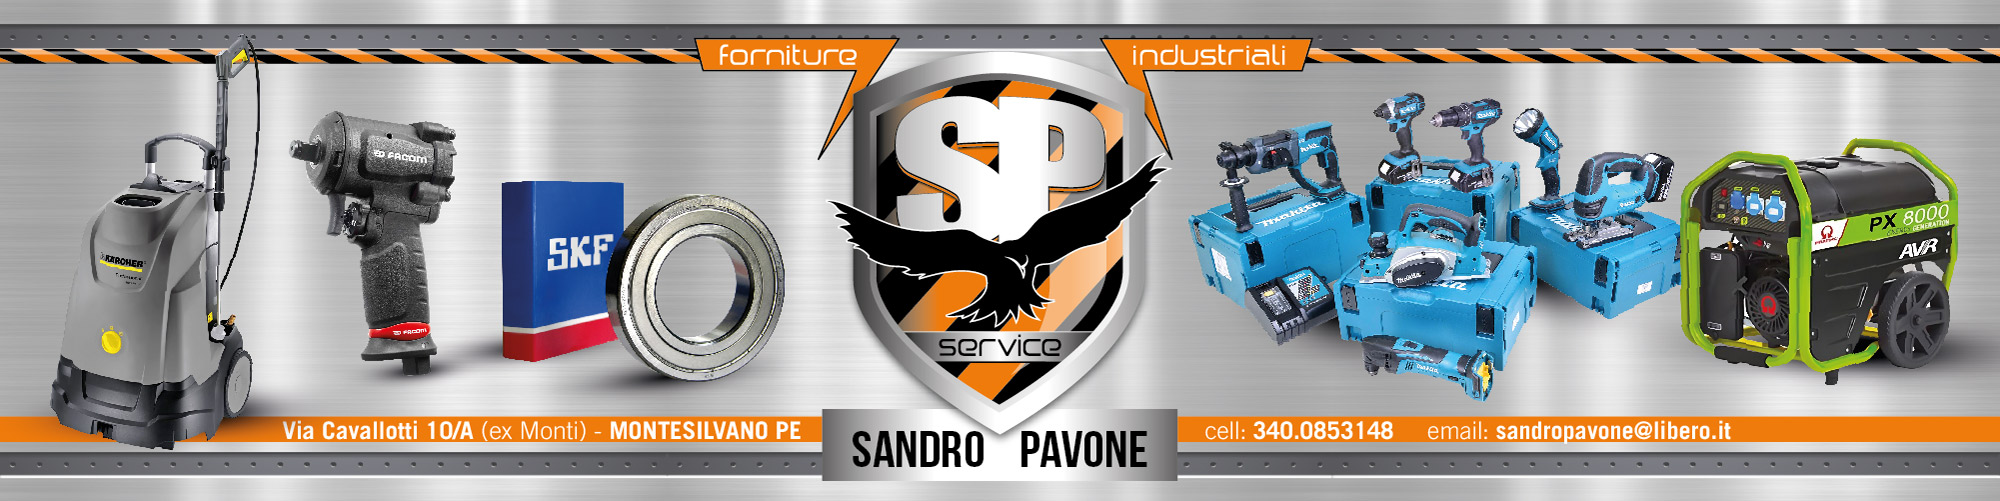 Sandro-Pavone